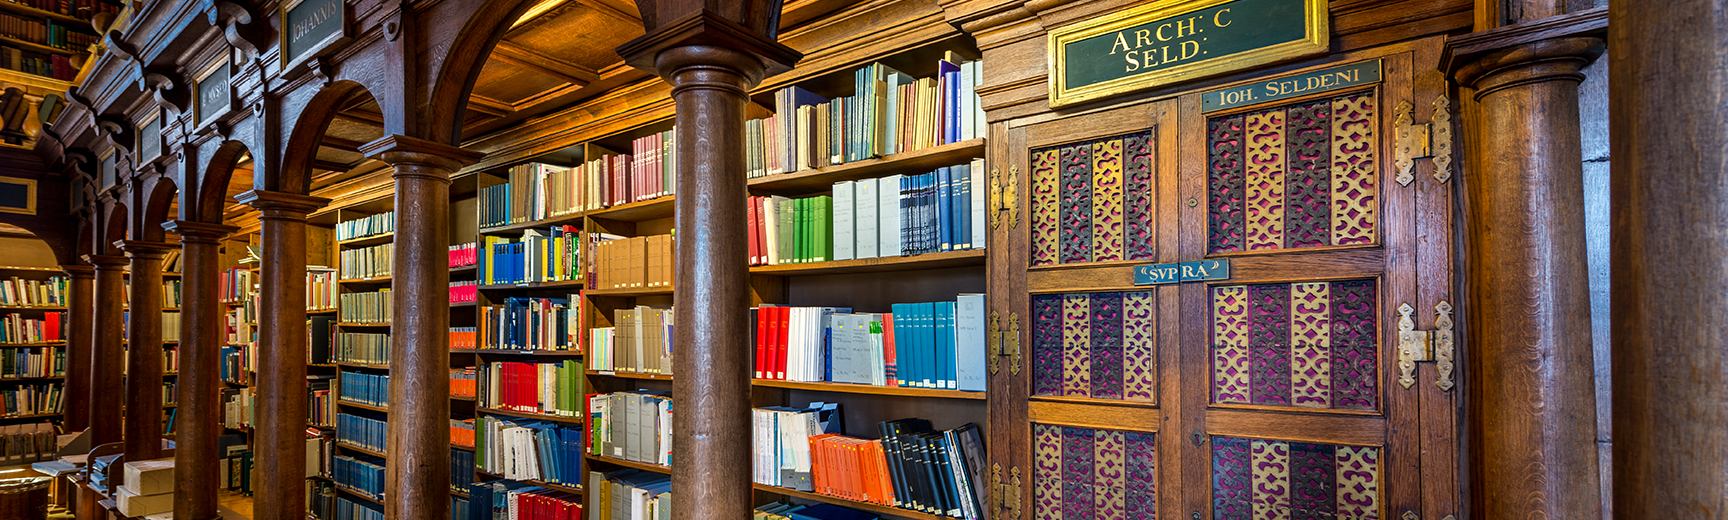 The Bodleian Libraries, Duke Humphreys